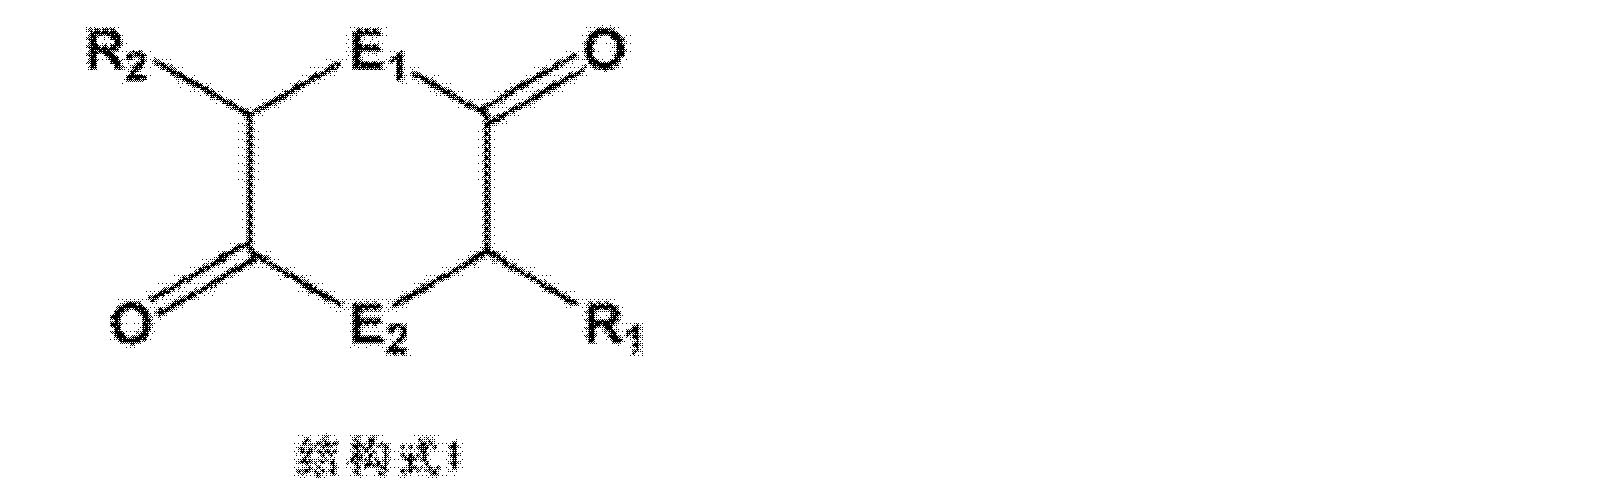 Figure CN102985125AD00261